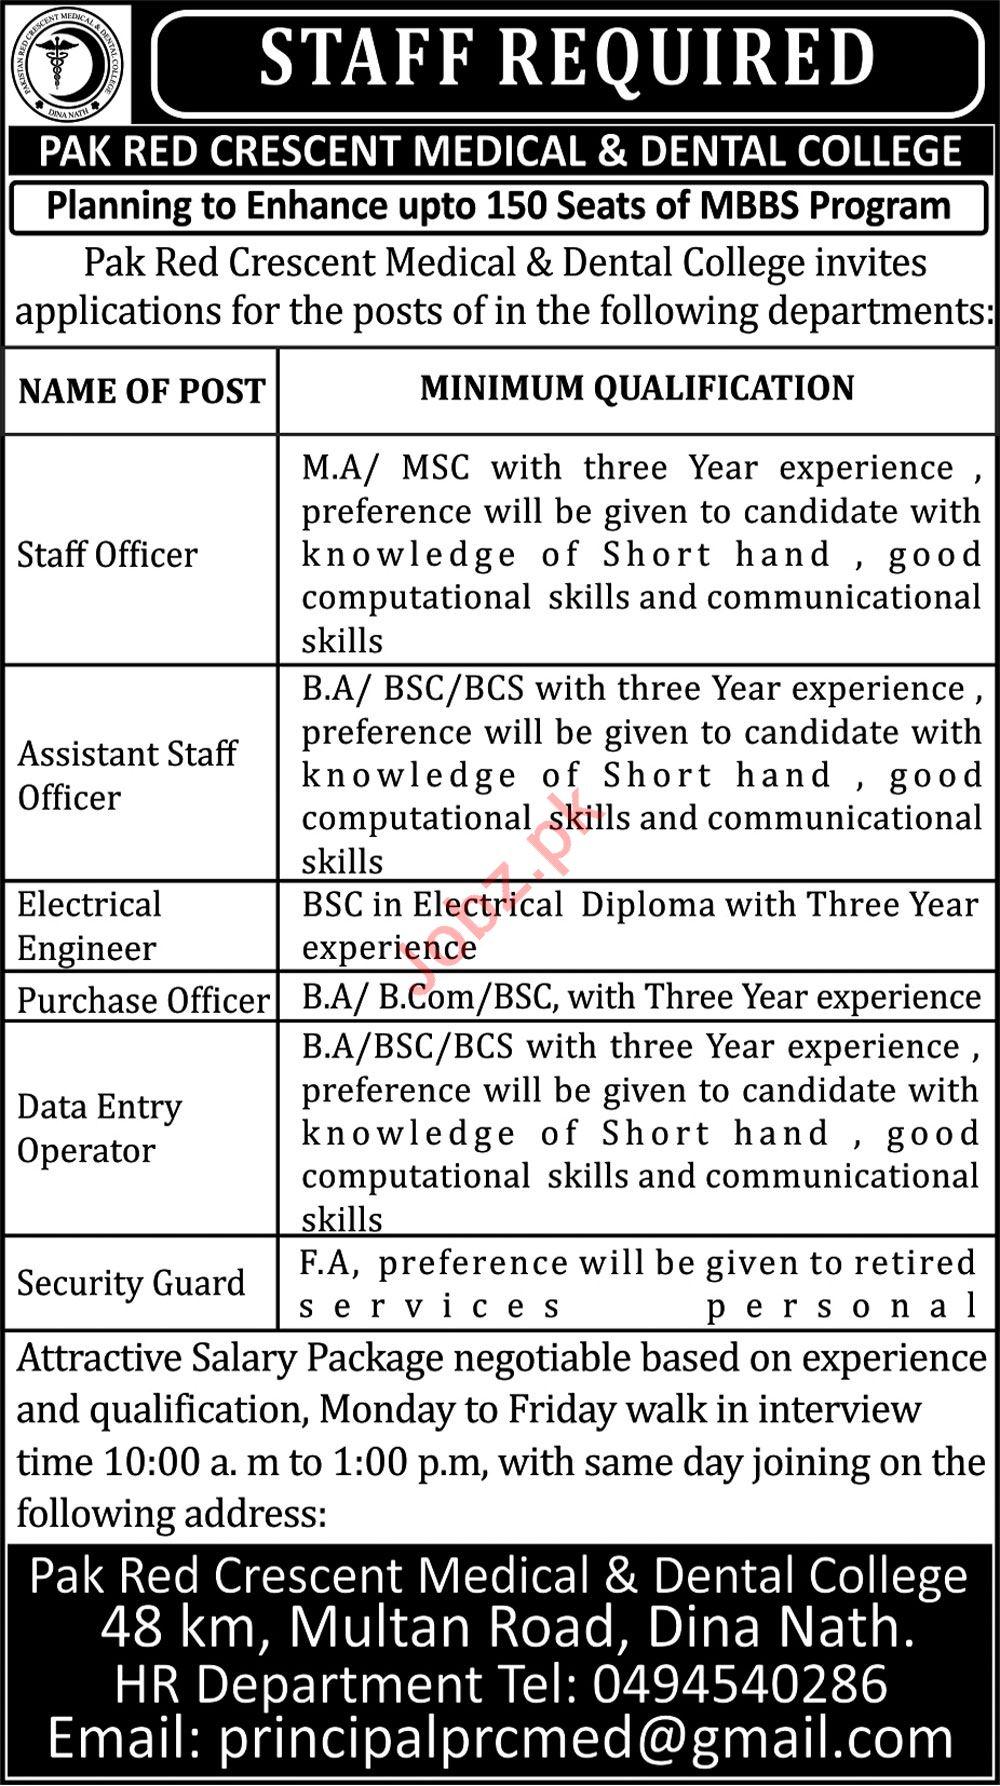 Pak Red Crescent Medical & Dental College Multan Jobs 2018